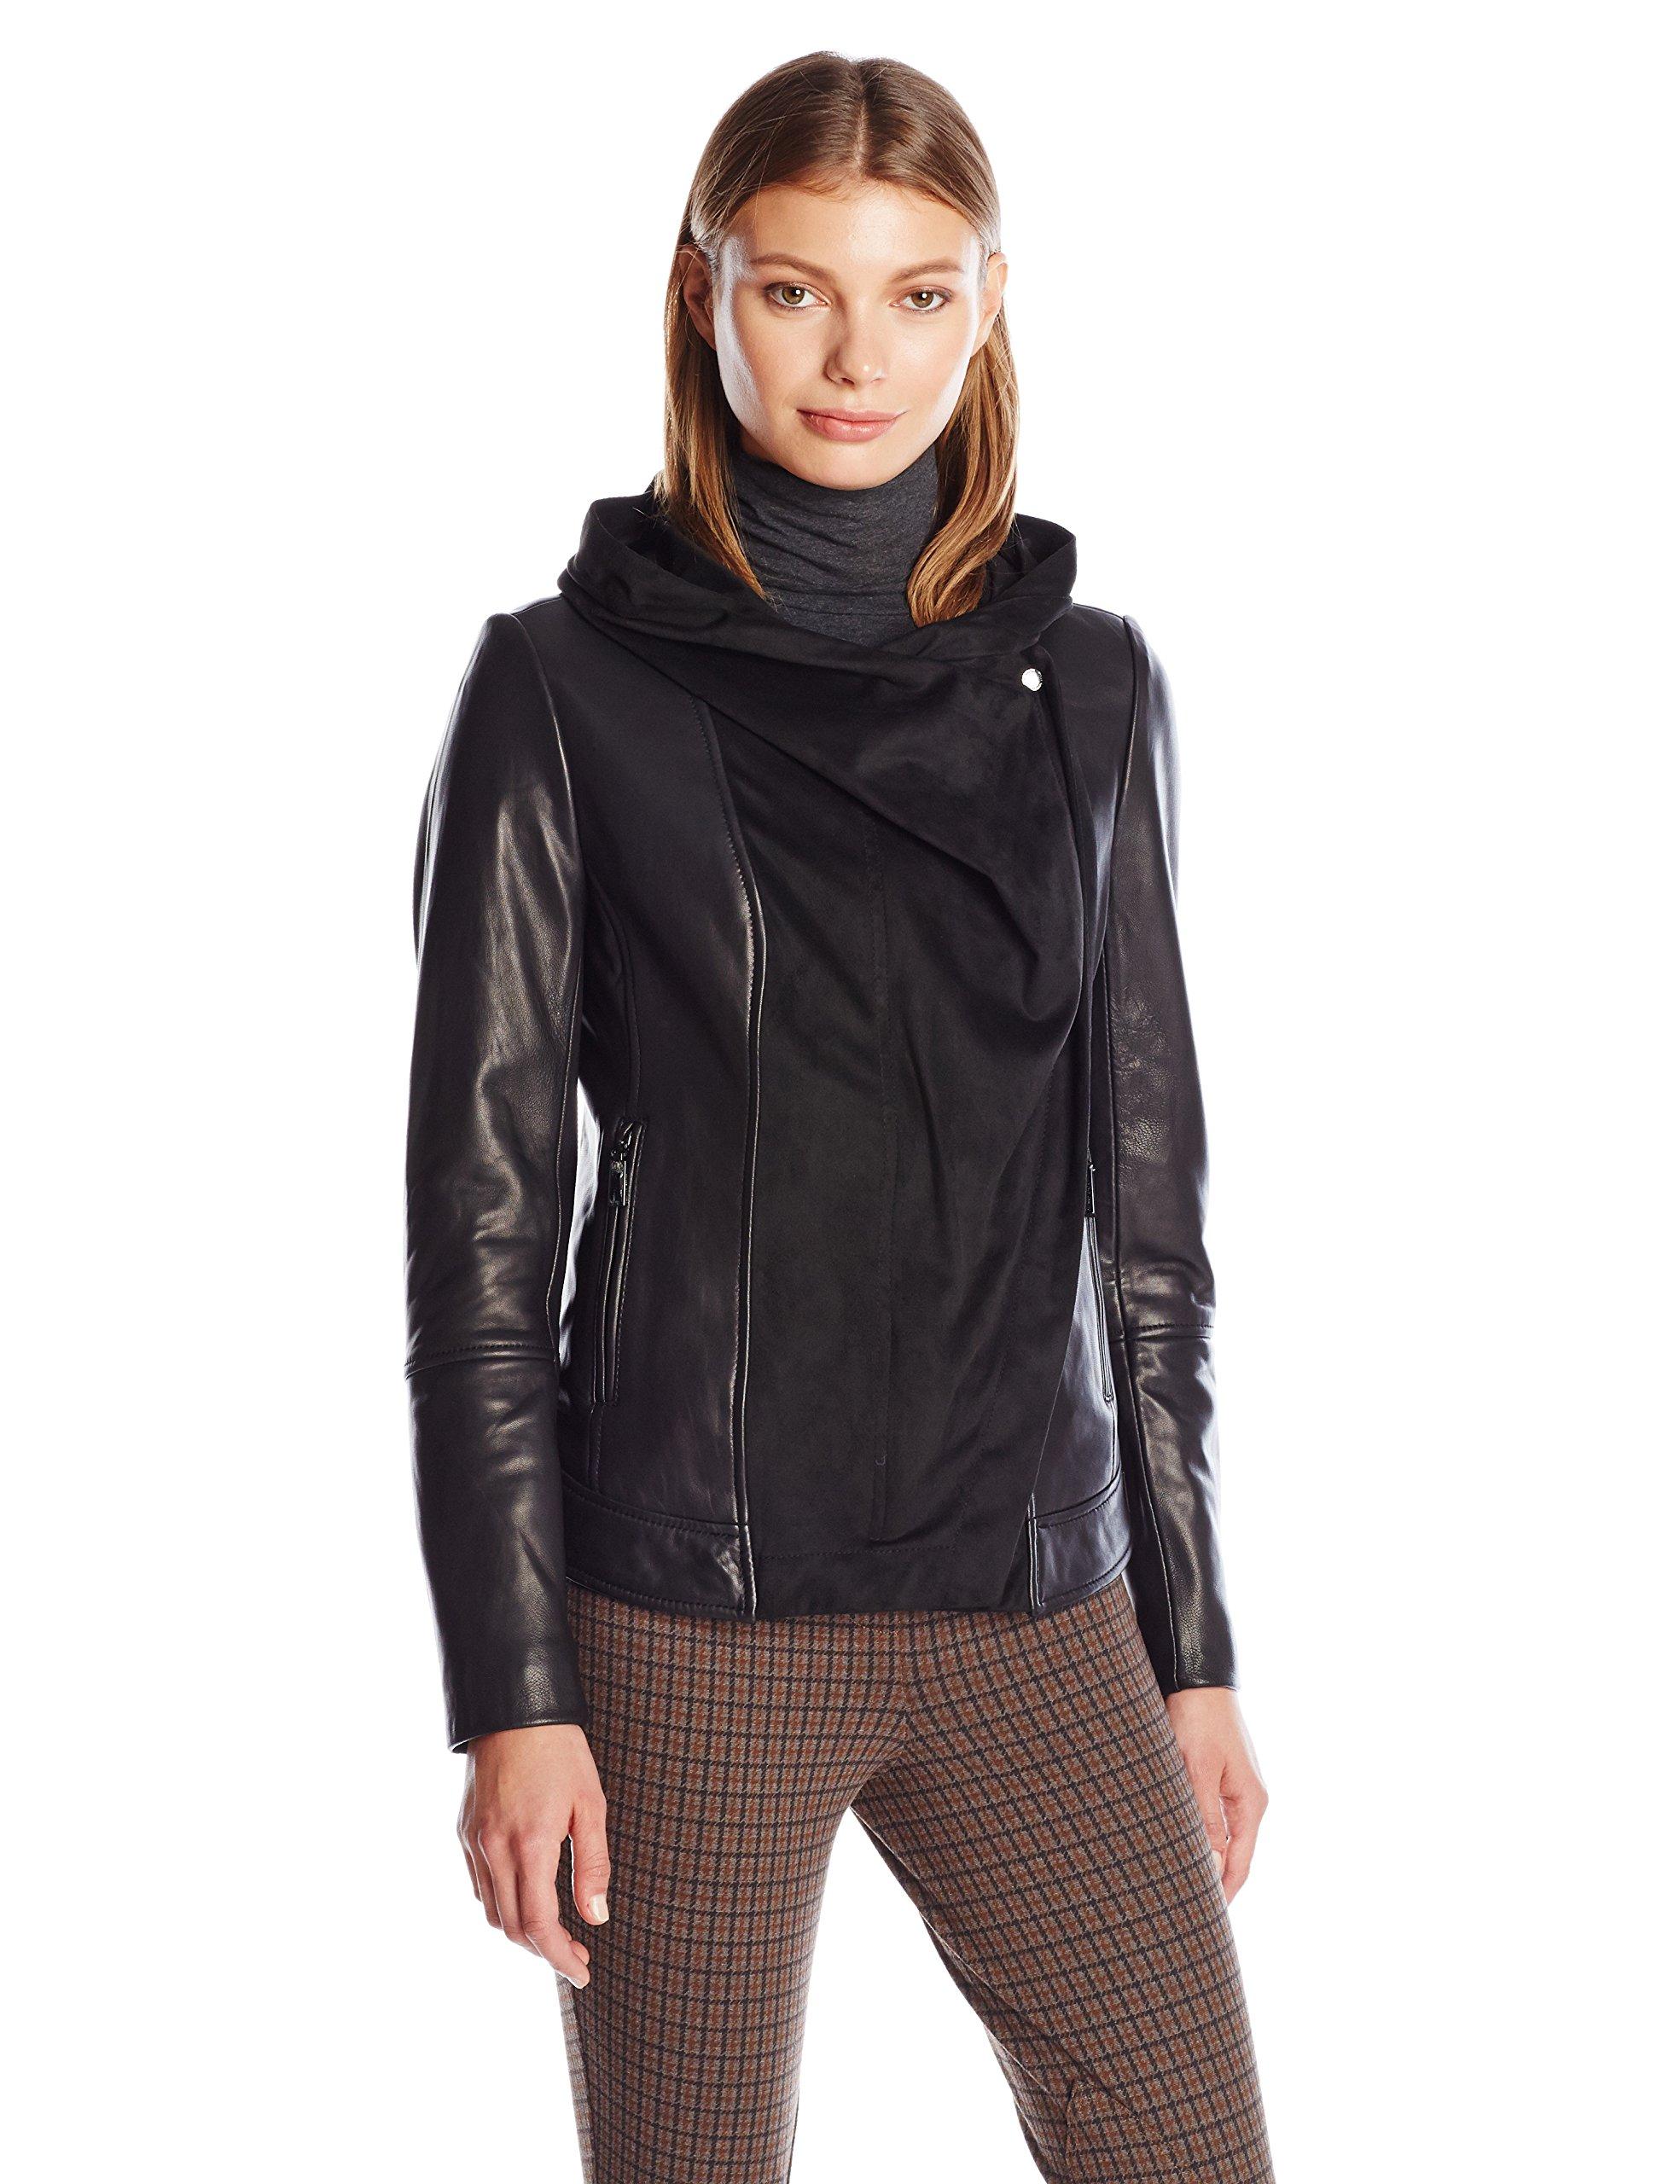 Vince Camuto Women's Asymmetrical Zip Mix Media Leather Jacket, Black, L